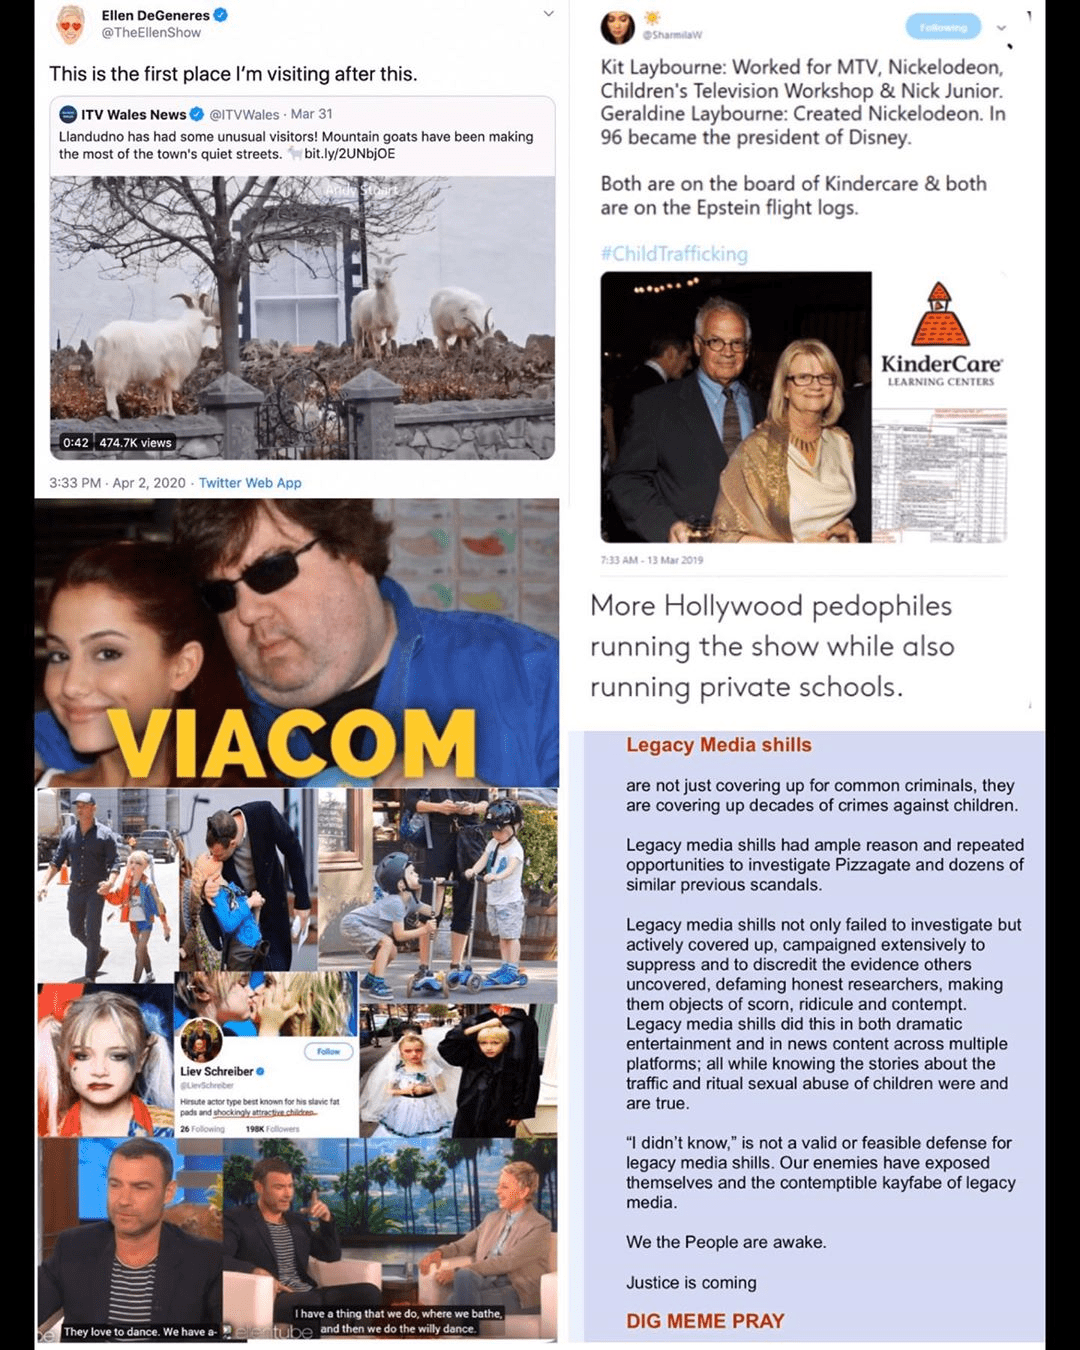 Ellen DeGeneres, Liev Schreiber, Kit Laybourne, and Geraldine Laybourne Involved In Pedophilia? – Pedophile Rings & Satanism Are Rampant In Hollywood Elite Circles